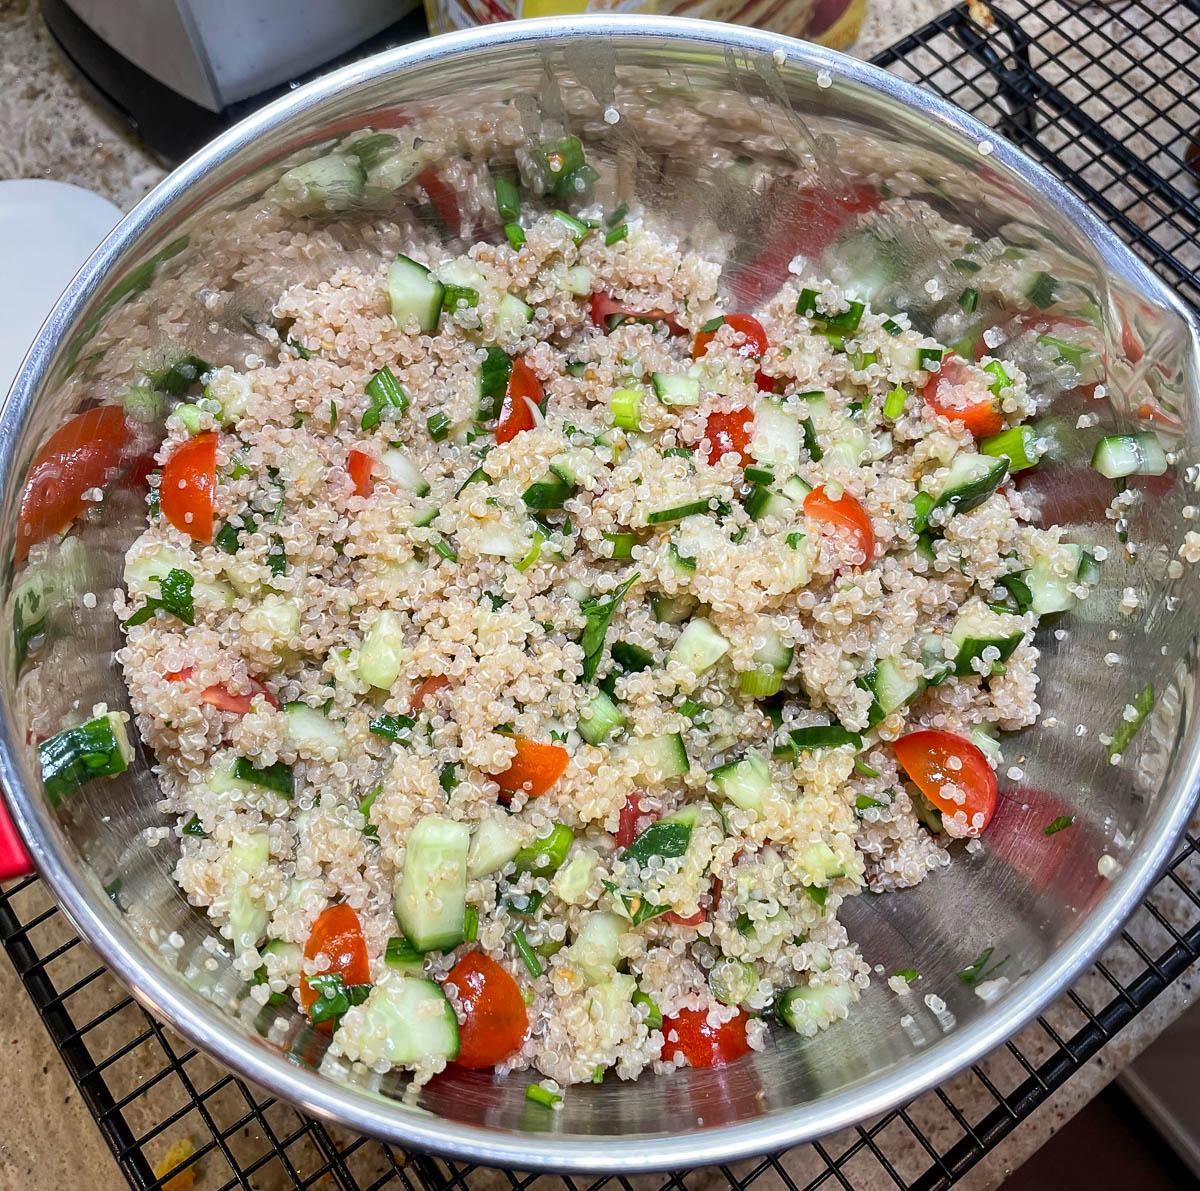 freshly mixed quinoa tabbouleh